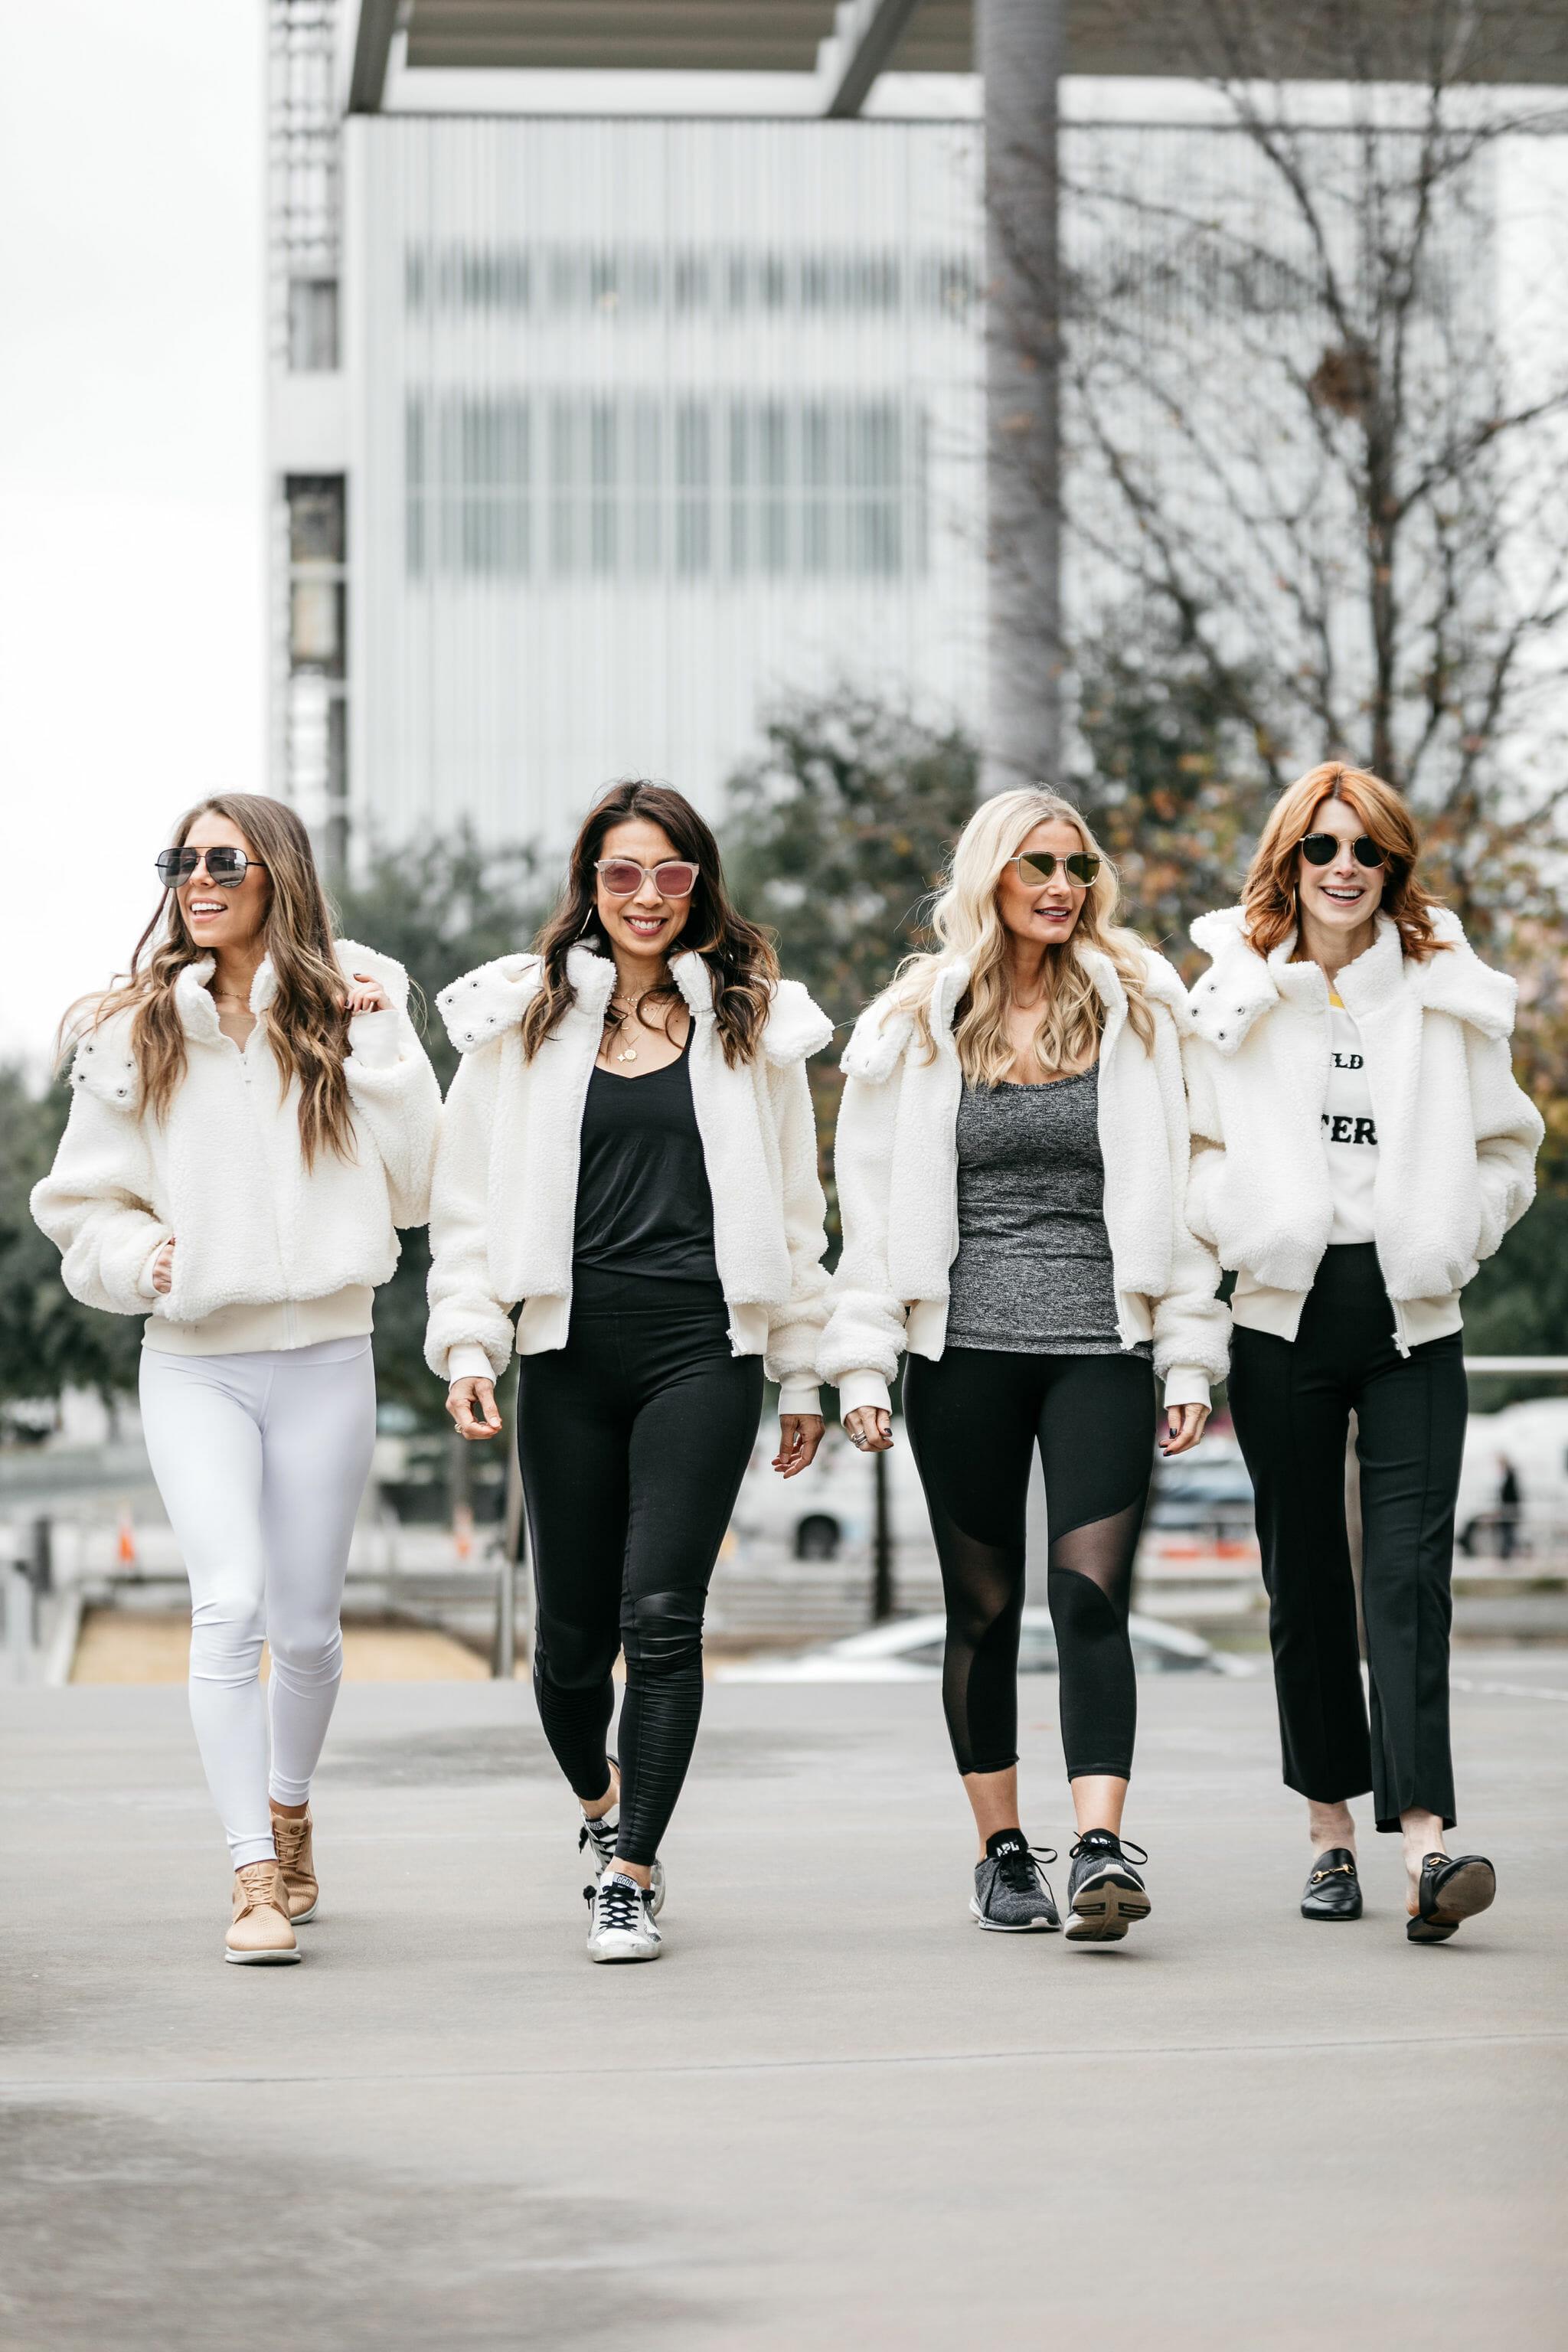 Alo yoga wear on Dallas bloggers